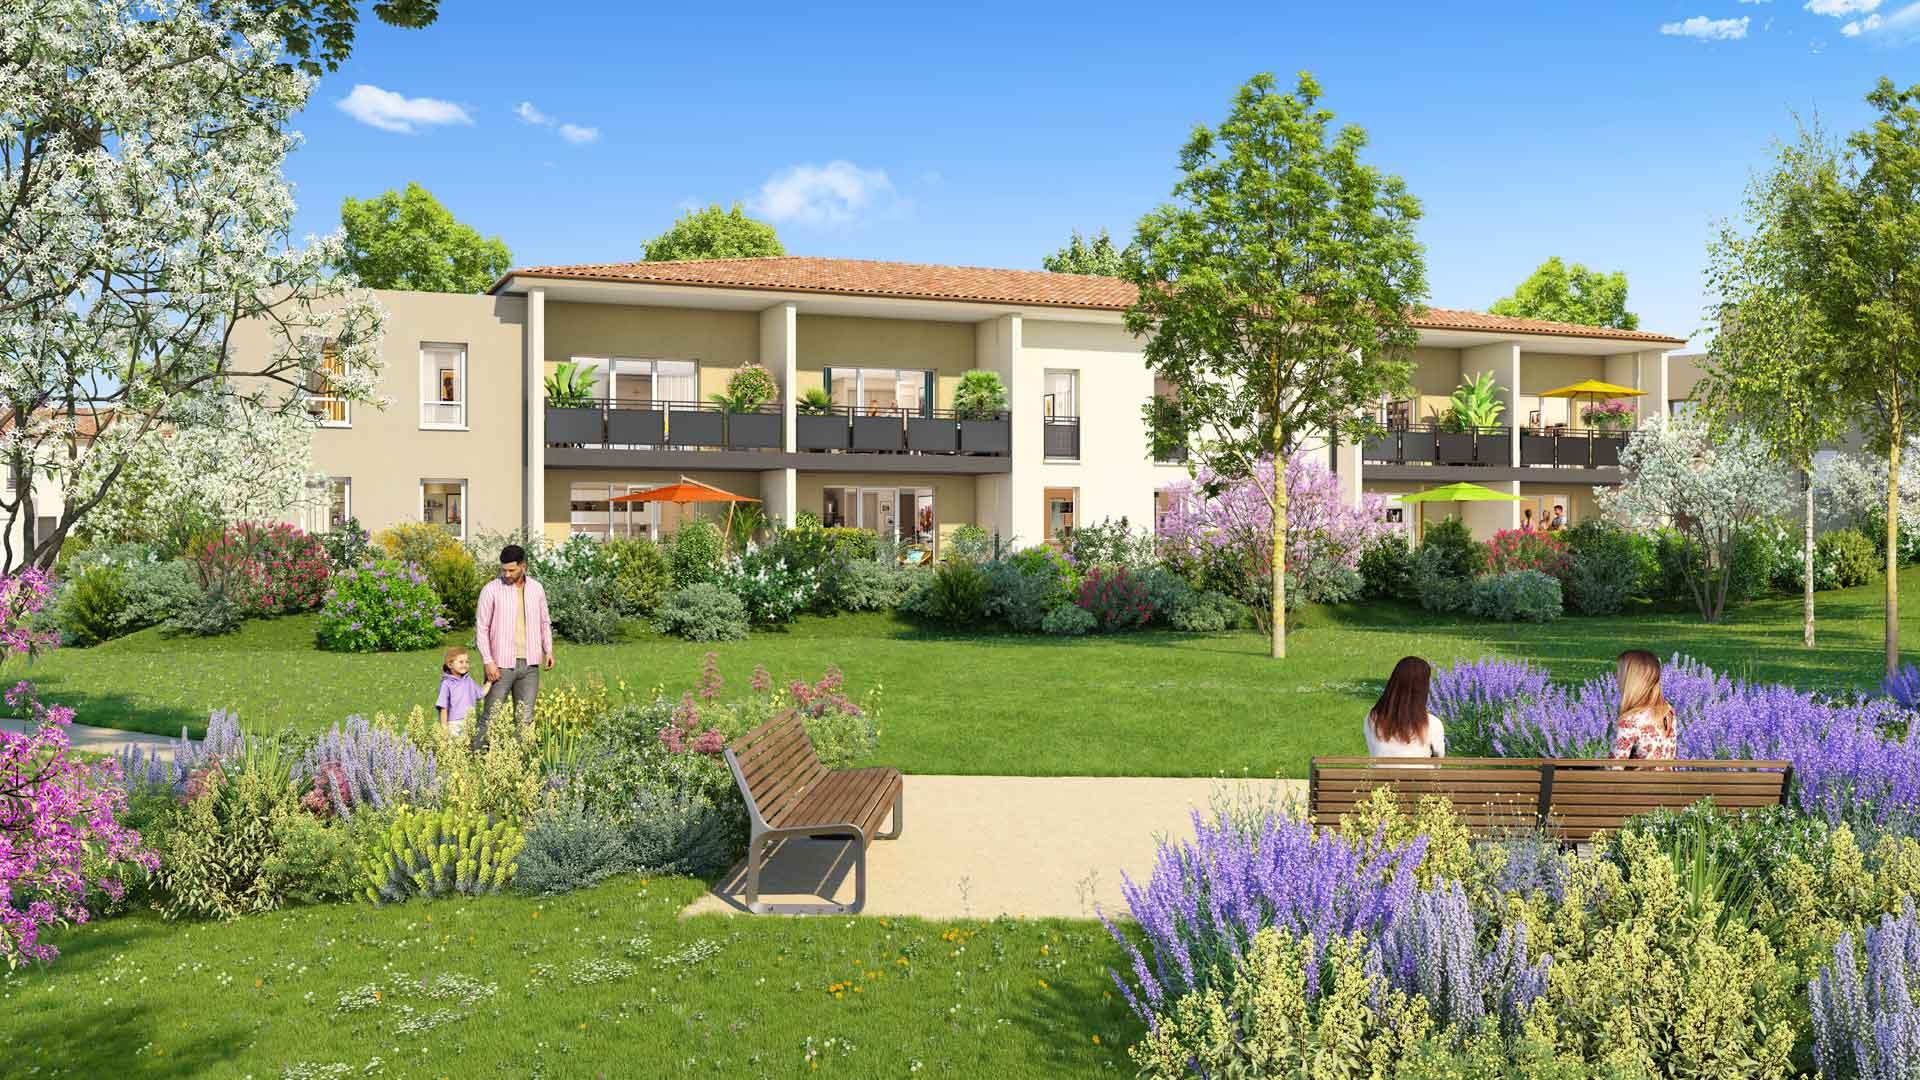 13120GARDANNEHarmonie Provence